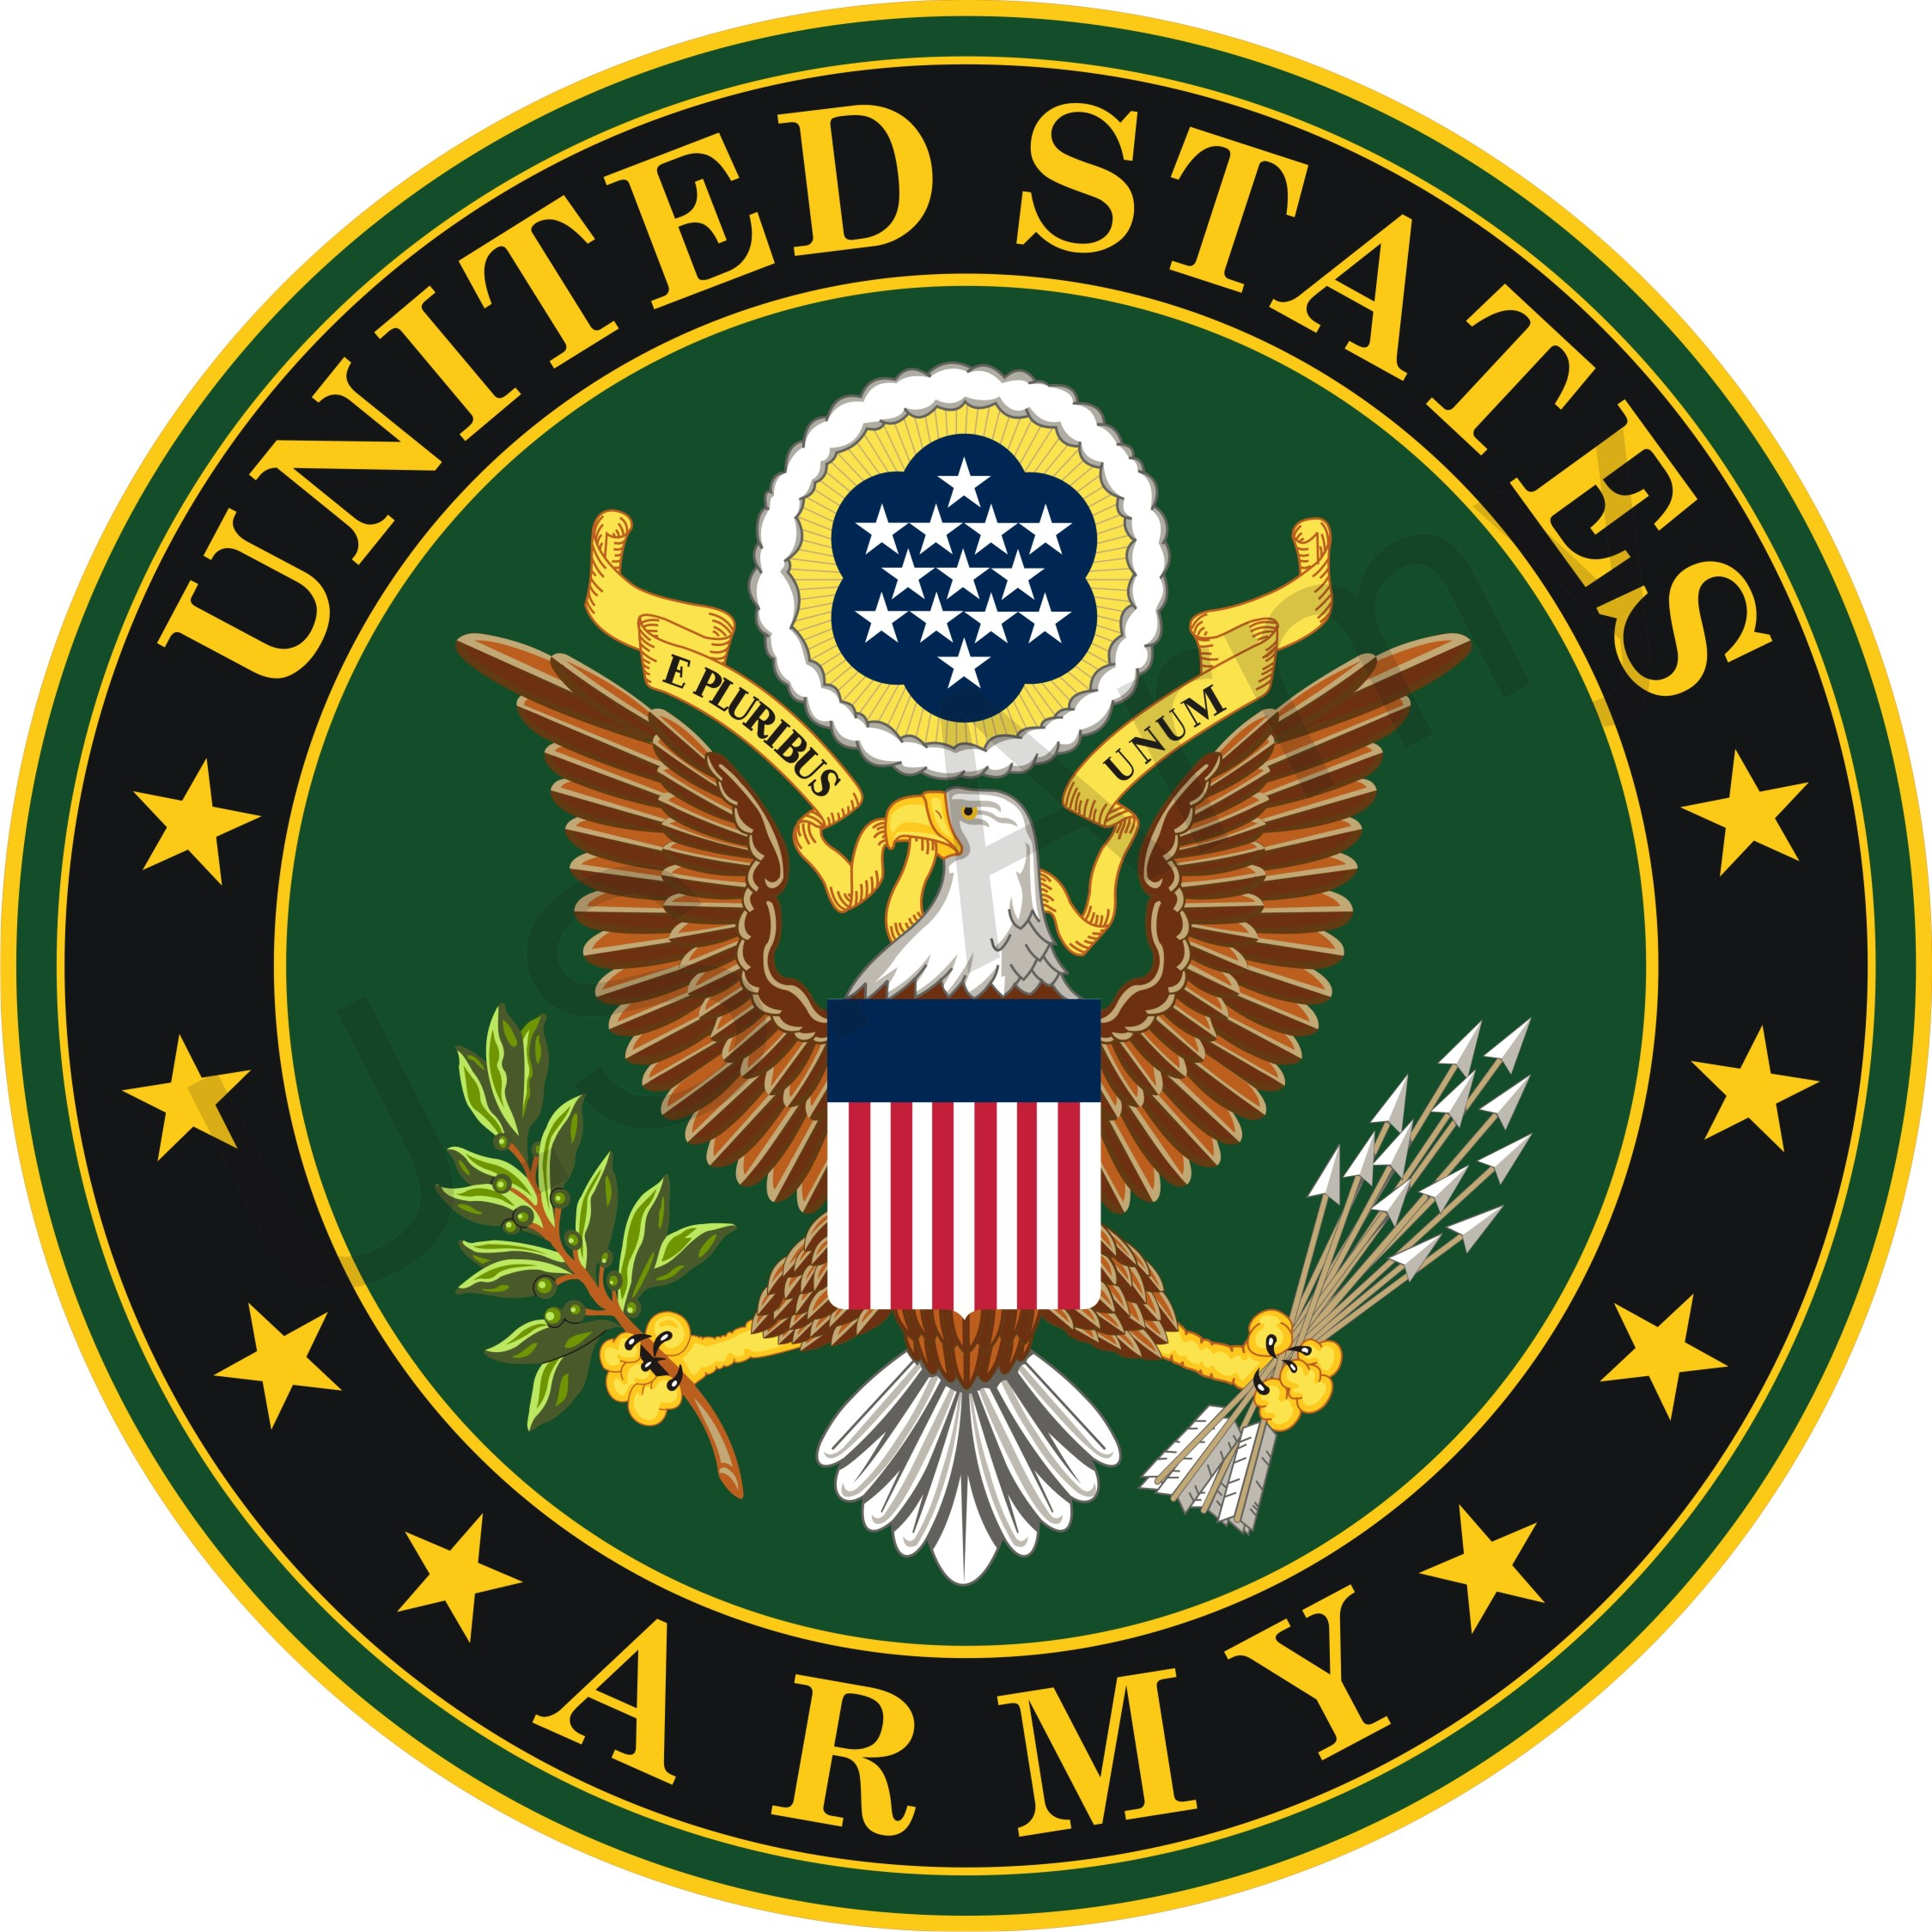 Army Emblem Clipart - Military Logos Clip Art